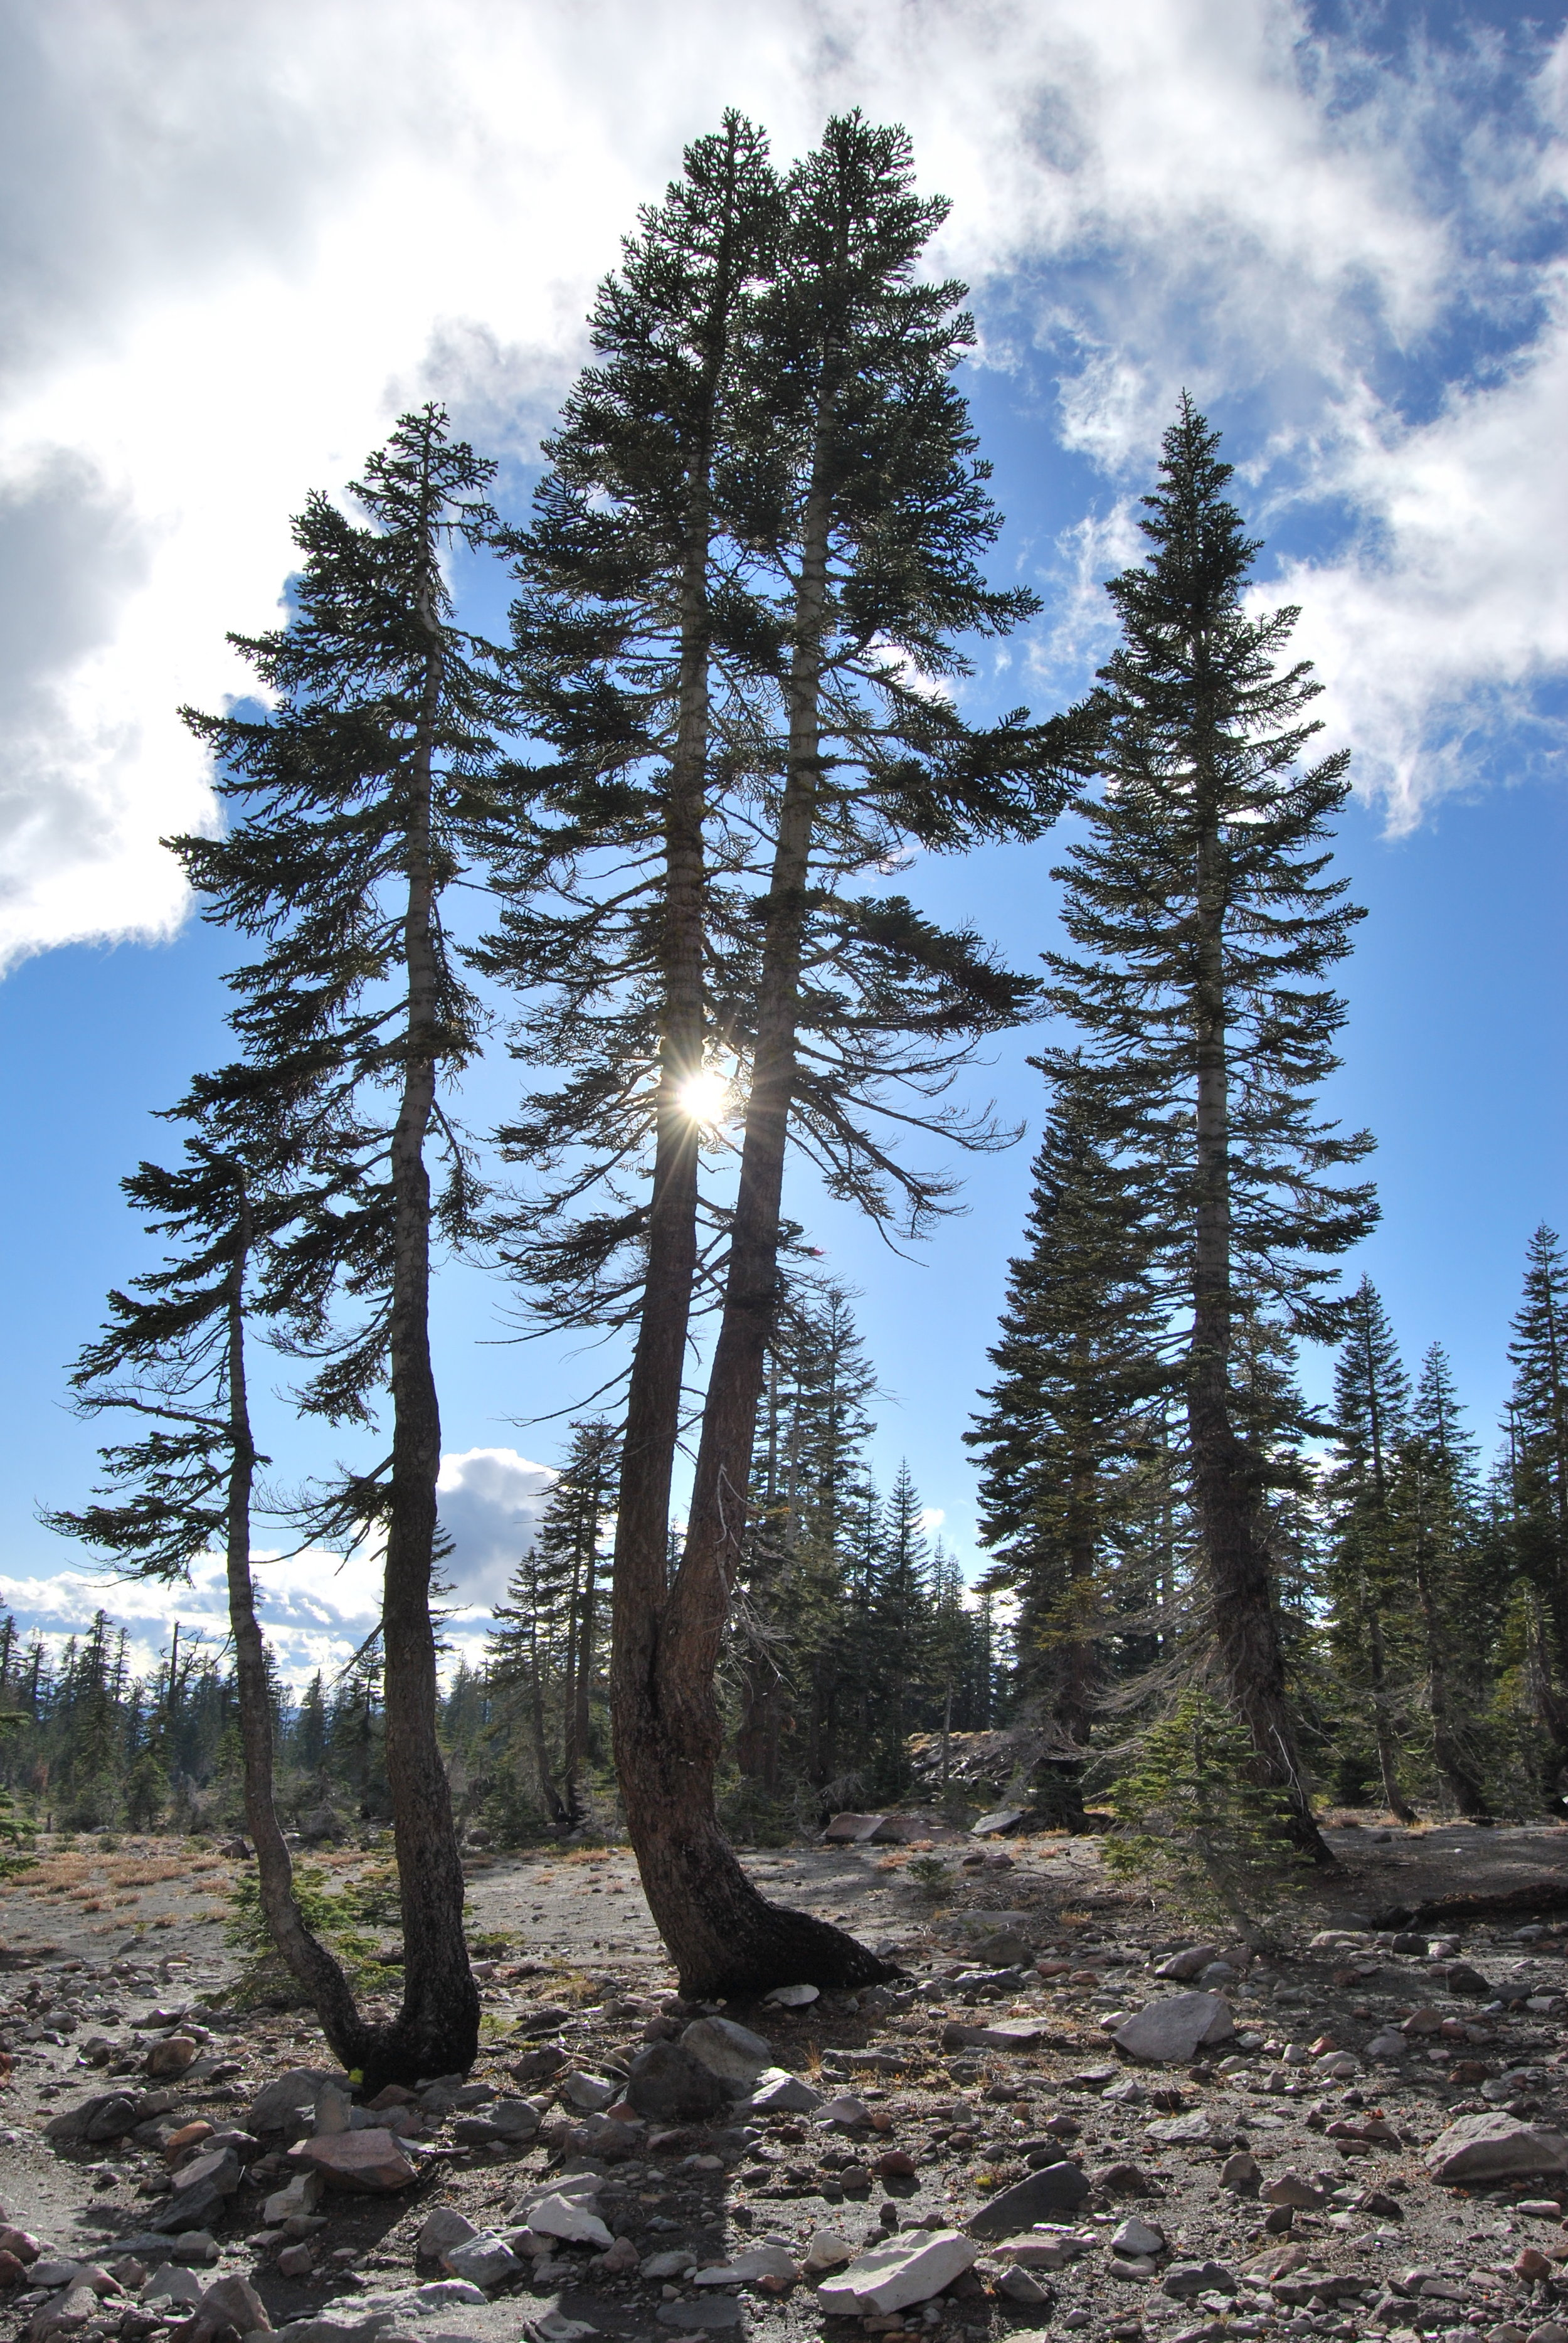 ART & NATURE  Art & Nature Talk at the Bioregional Ecology Center Harvest Dinner, October 28th, 2017   Bioregional Ecology Center  , Mt. Shasta, California